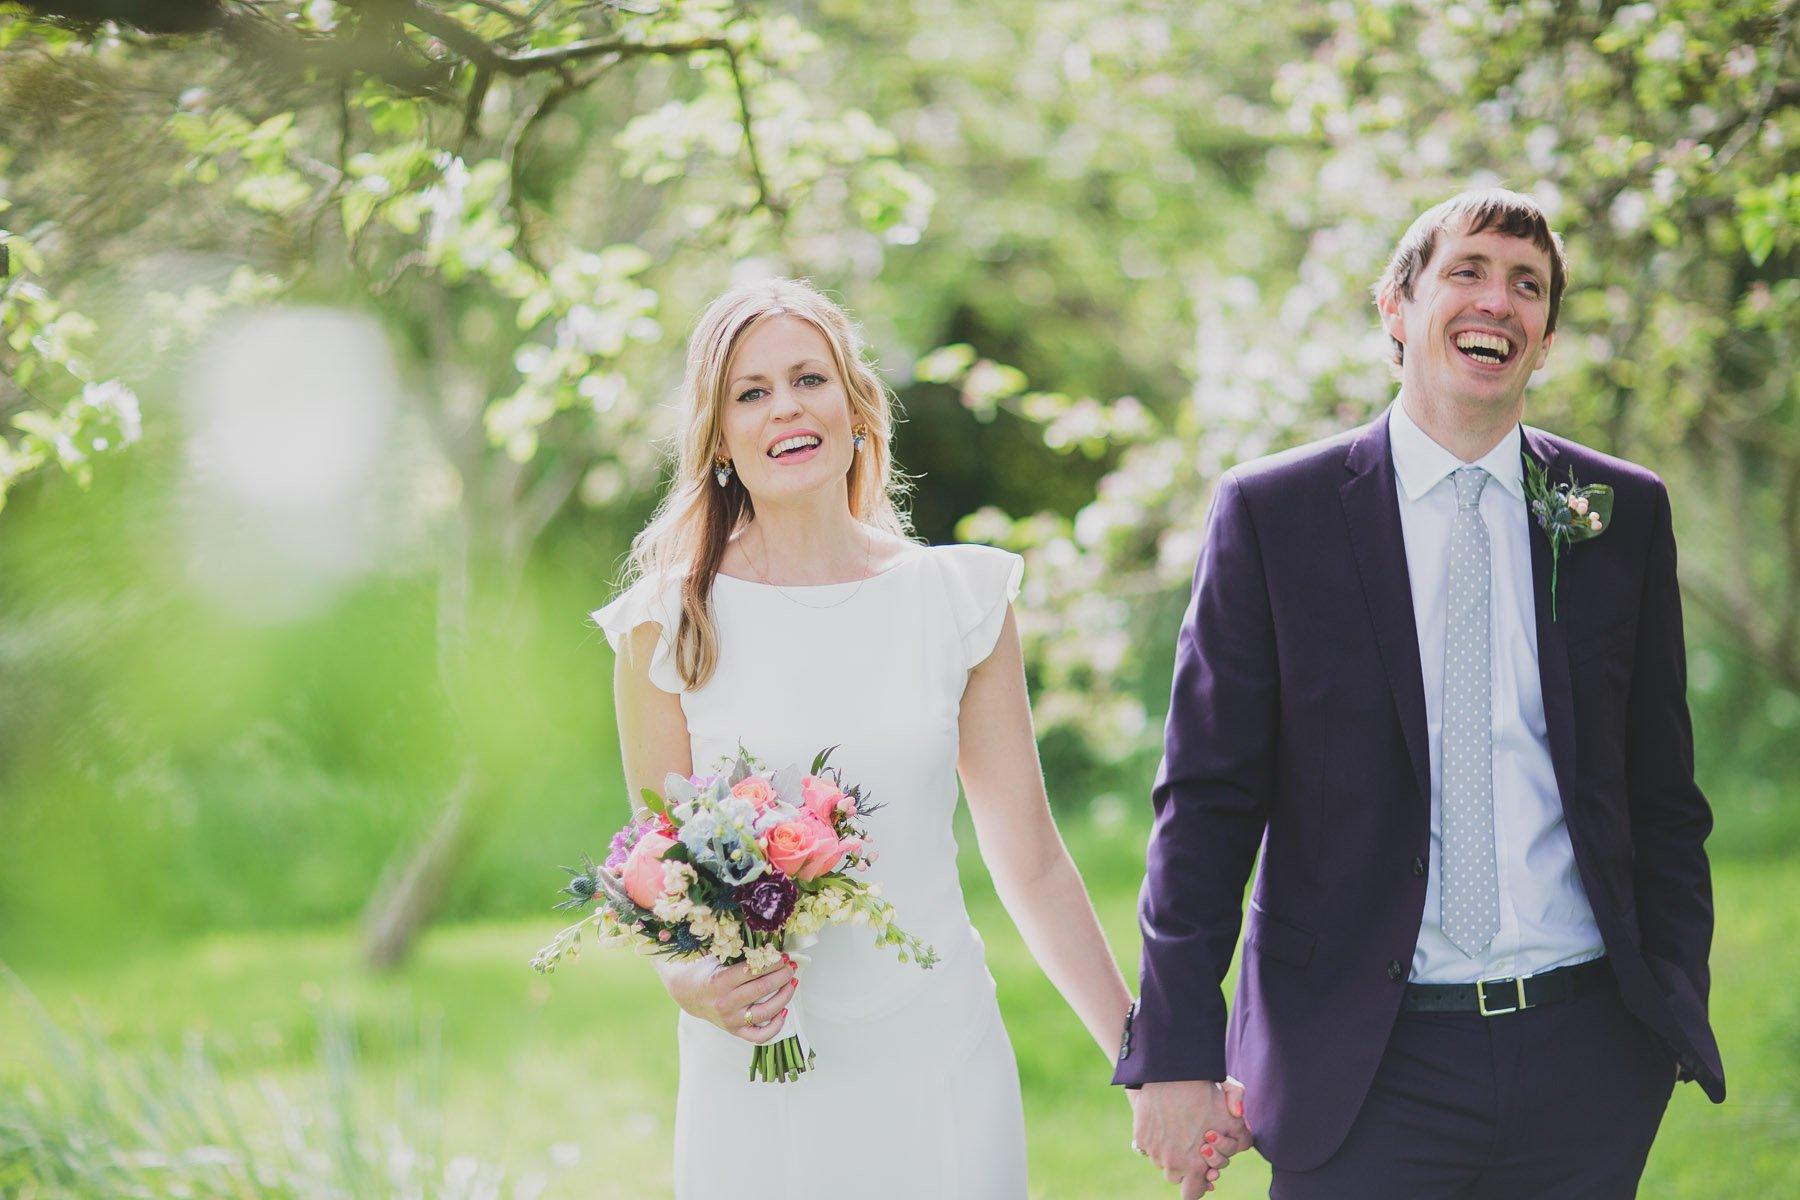 Buckinghamshire-Wedding-Lizzie-Duncan-101